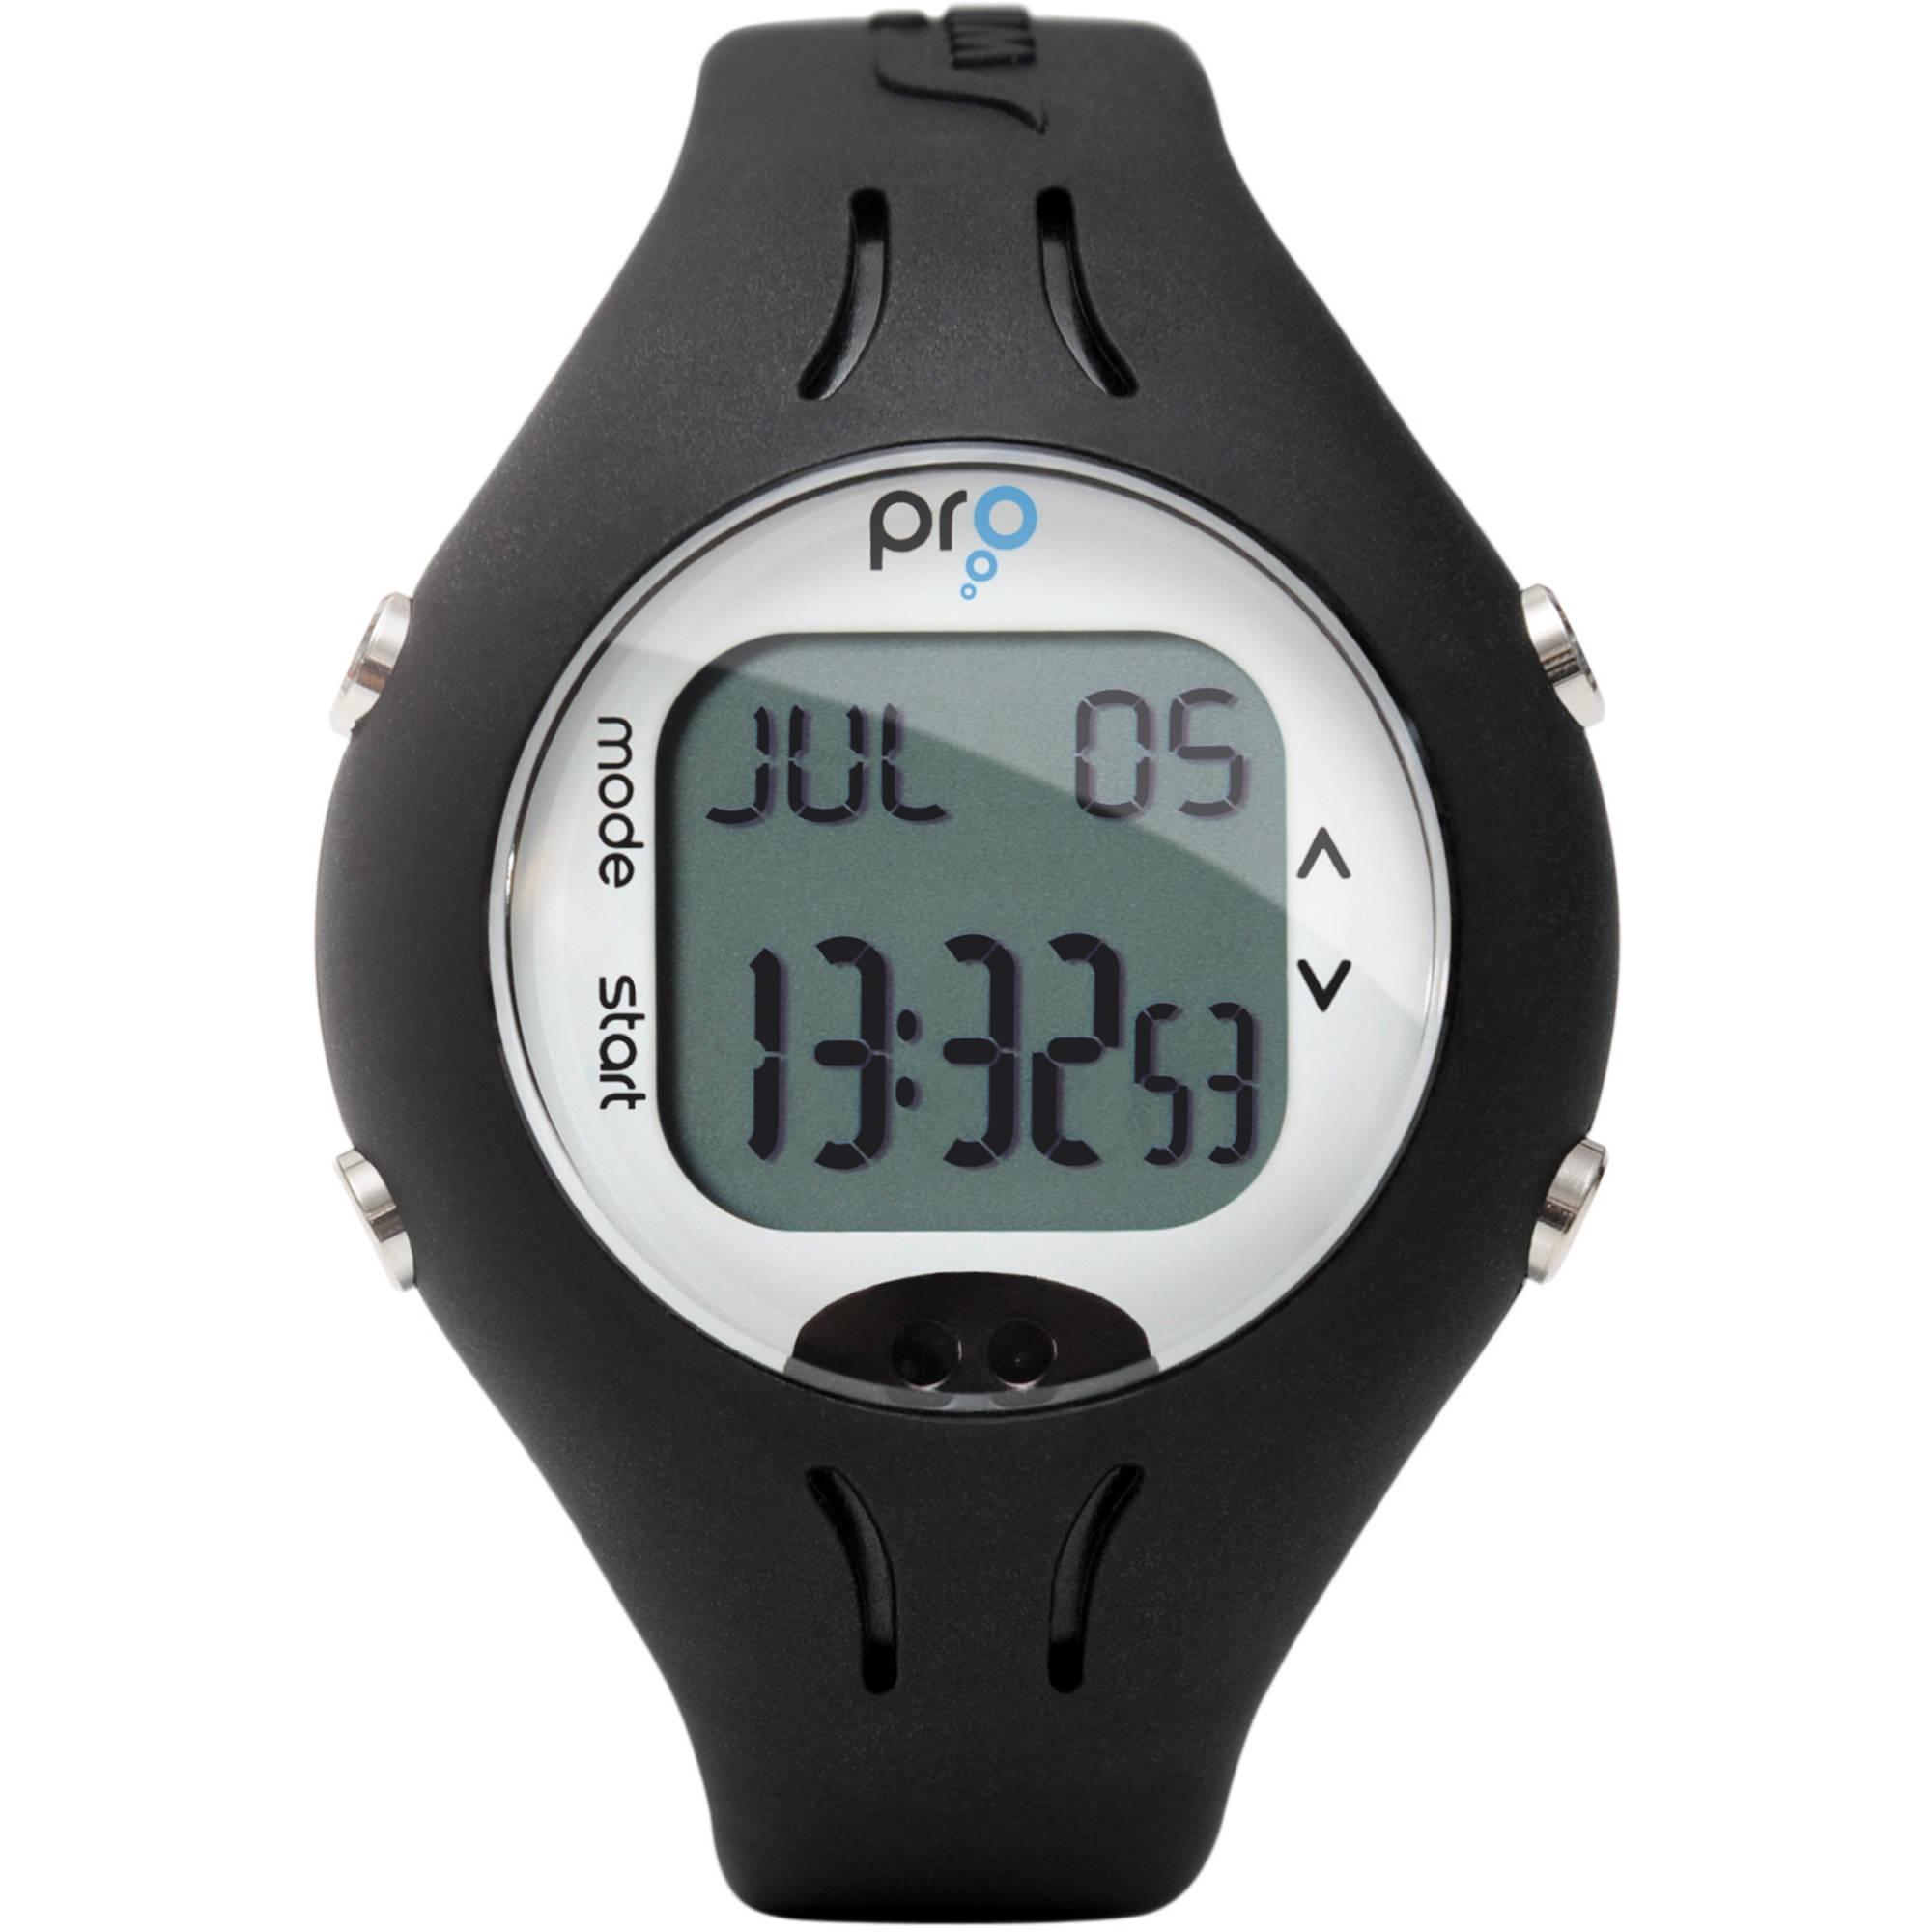 Swimovate PoolMate Pro Swimming Watch (Black) PMPRO B H Photo 13658869f